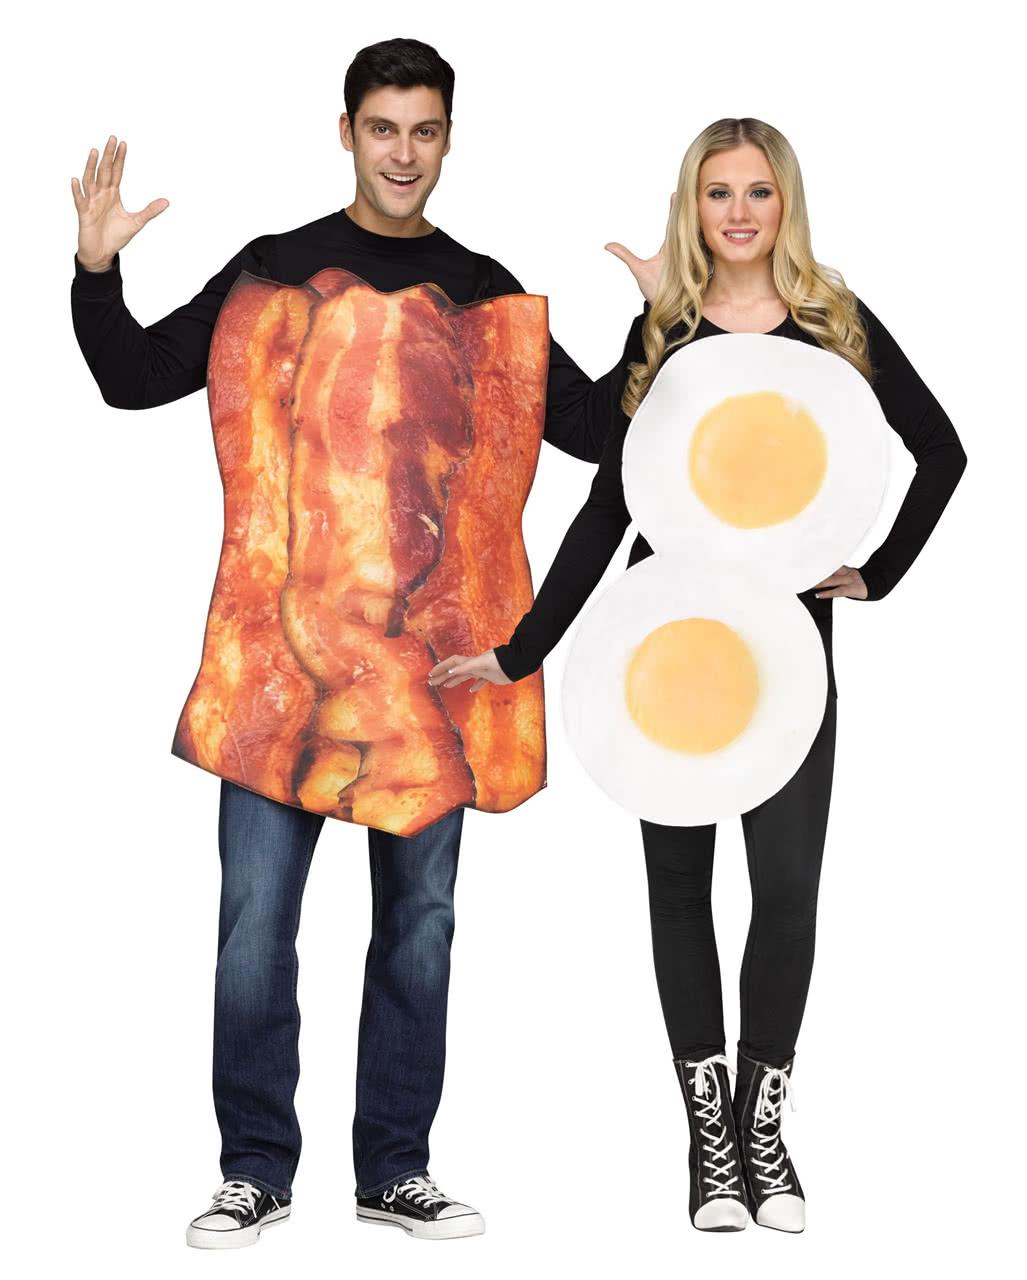 Fried Egg And Bacon Partner Costume ...  sc 1 st  Horror-Shop.com & Fried Egg And Bacon Partner Costume For carnival | horror-shop.com